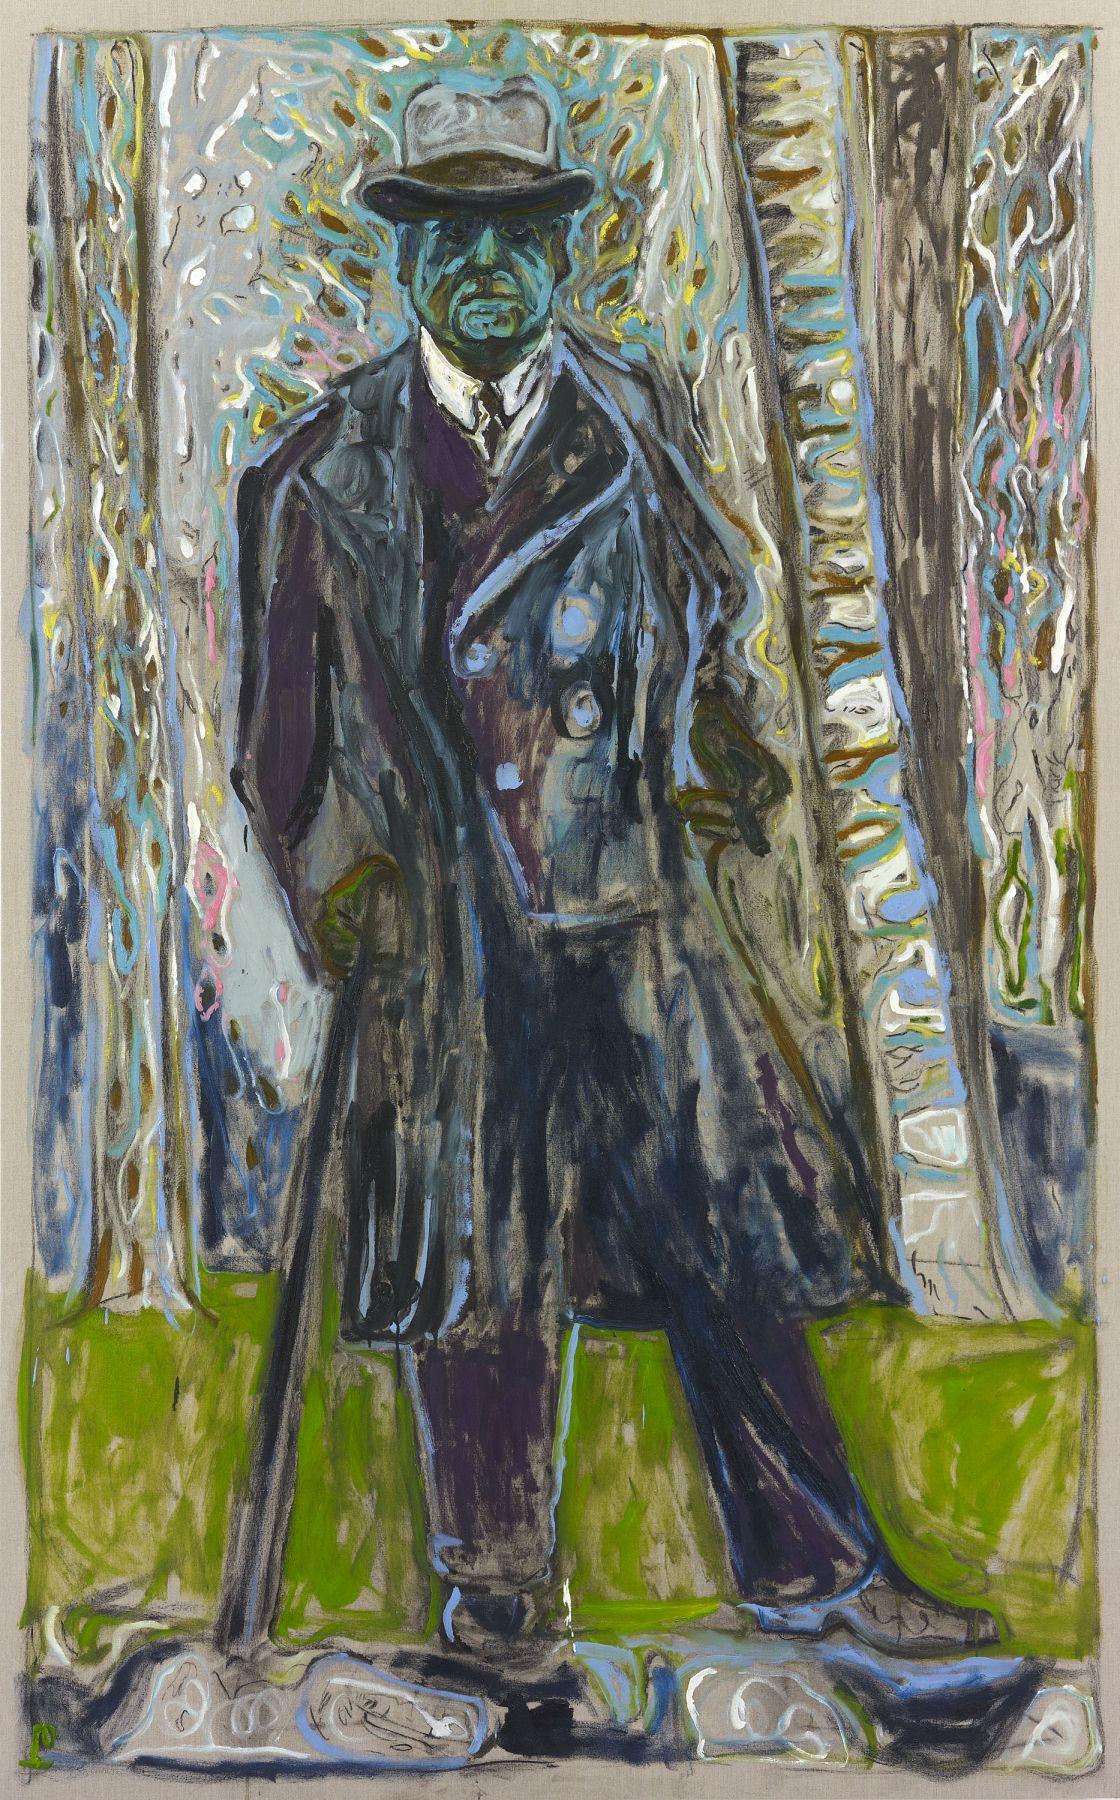 BILLY CHILDISH Sibalius (Man with Stick), 2011